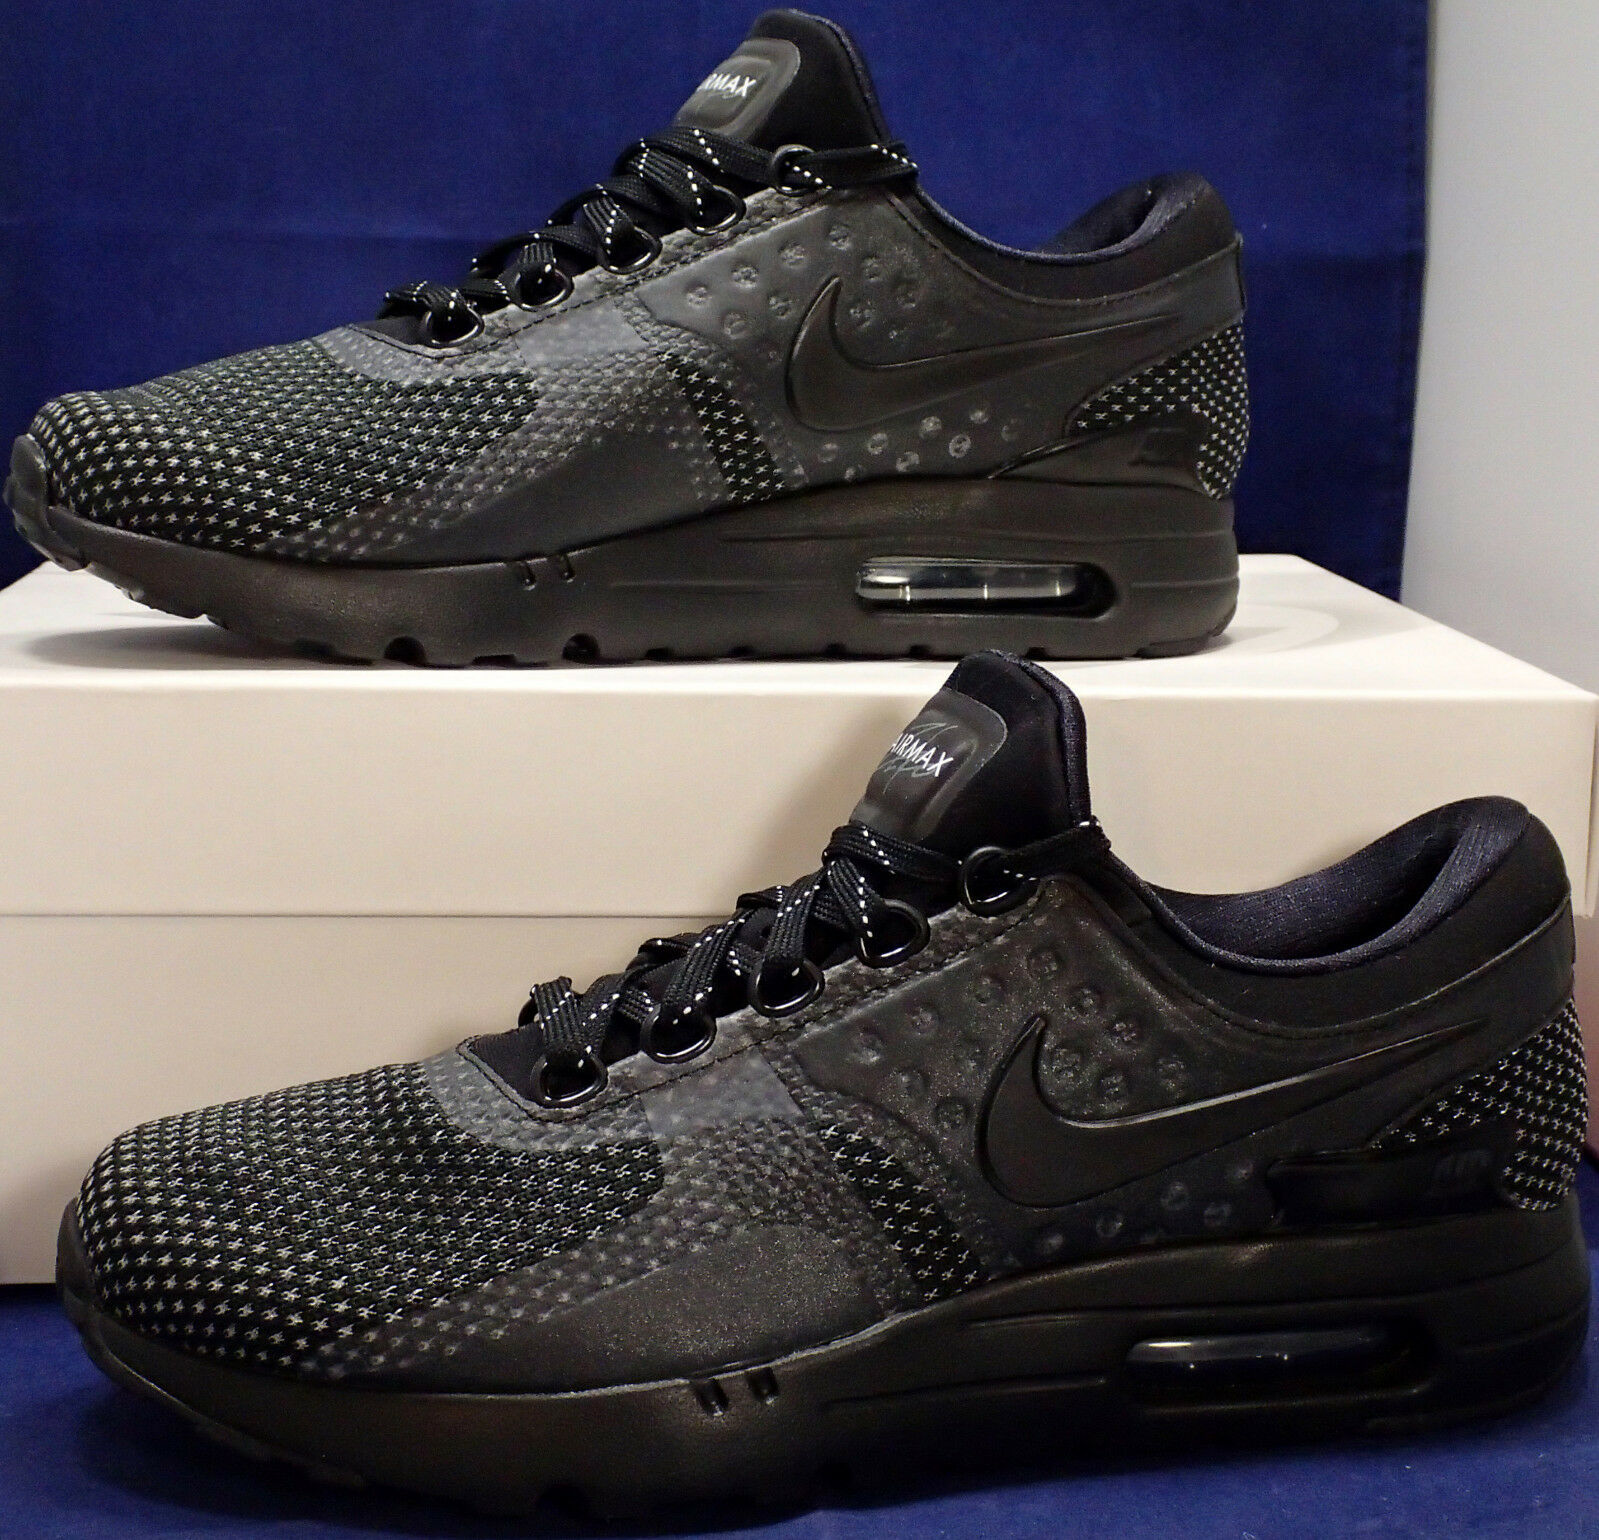 Nike Air Max Zero iD Black Price reduction